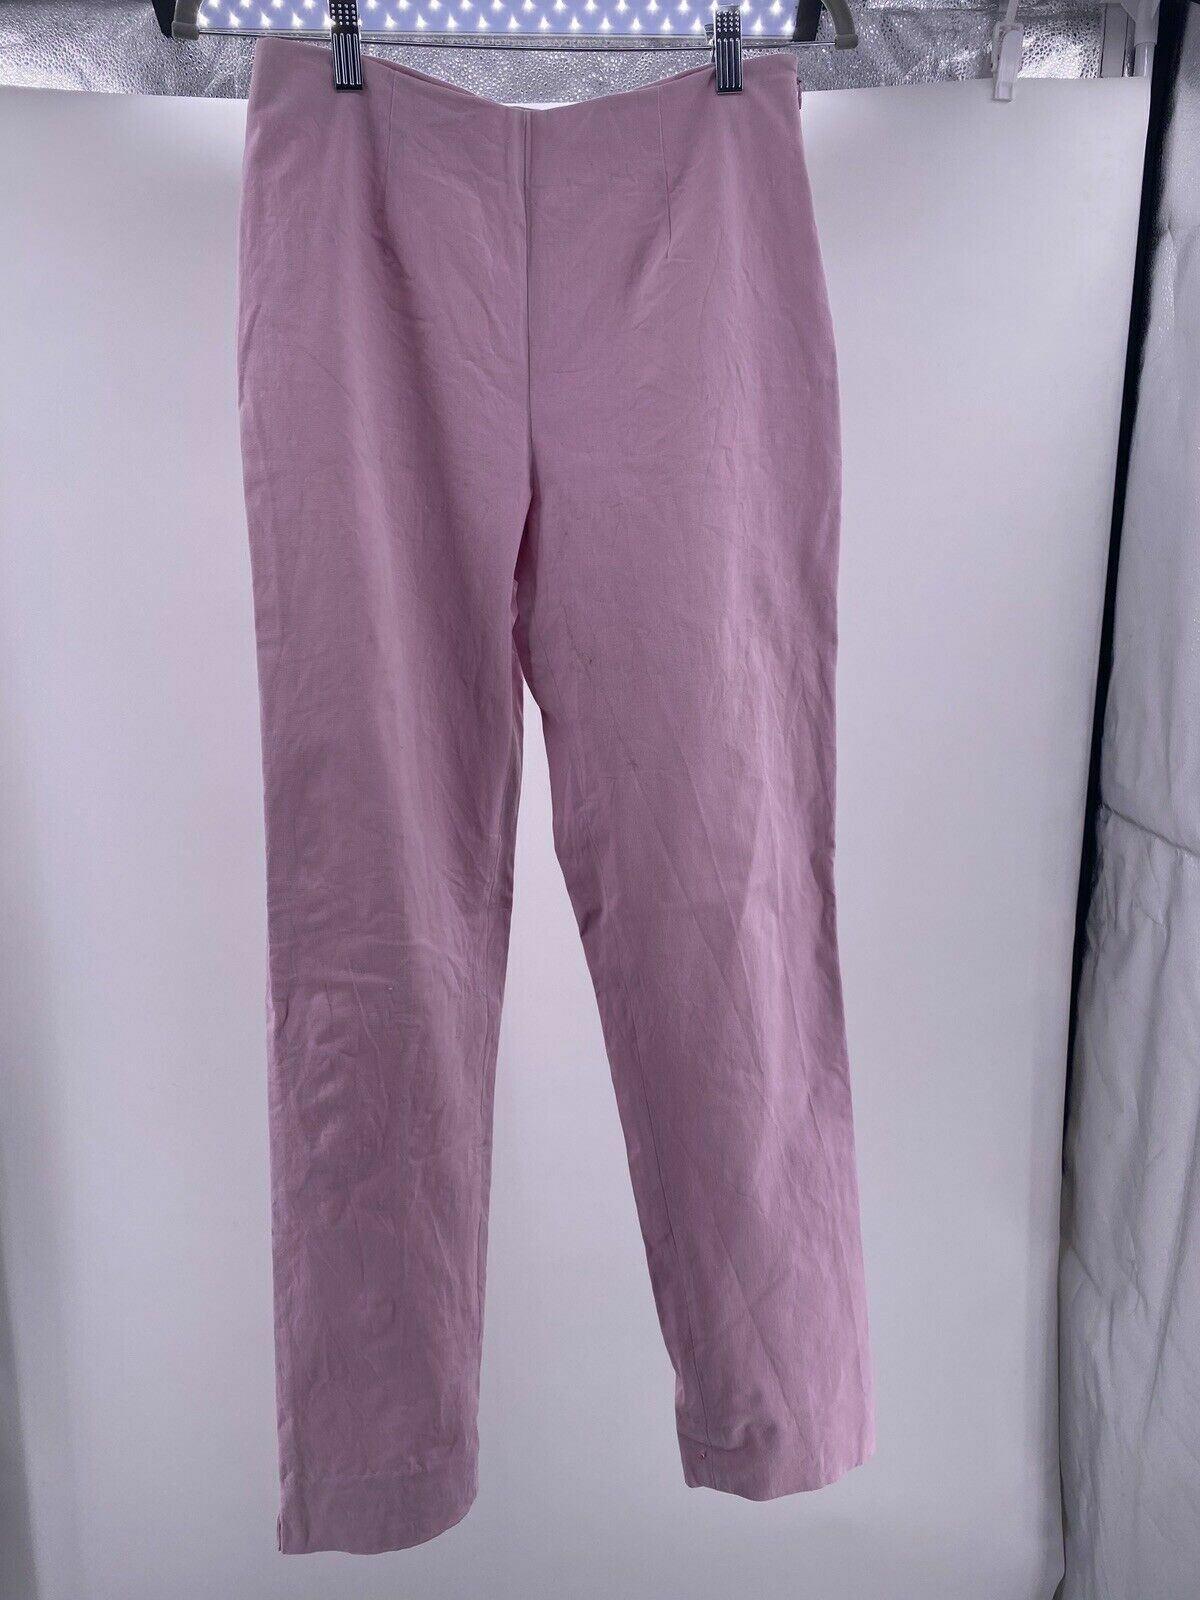 Leggiadro Womens Bubblegum Pink Pants Slacks - image 2